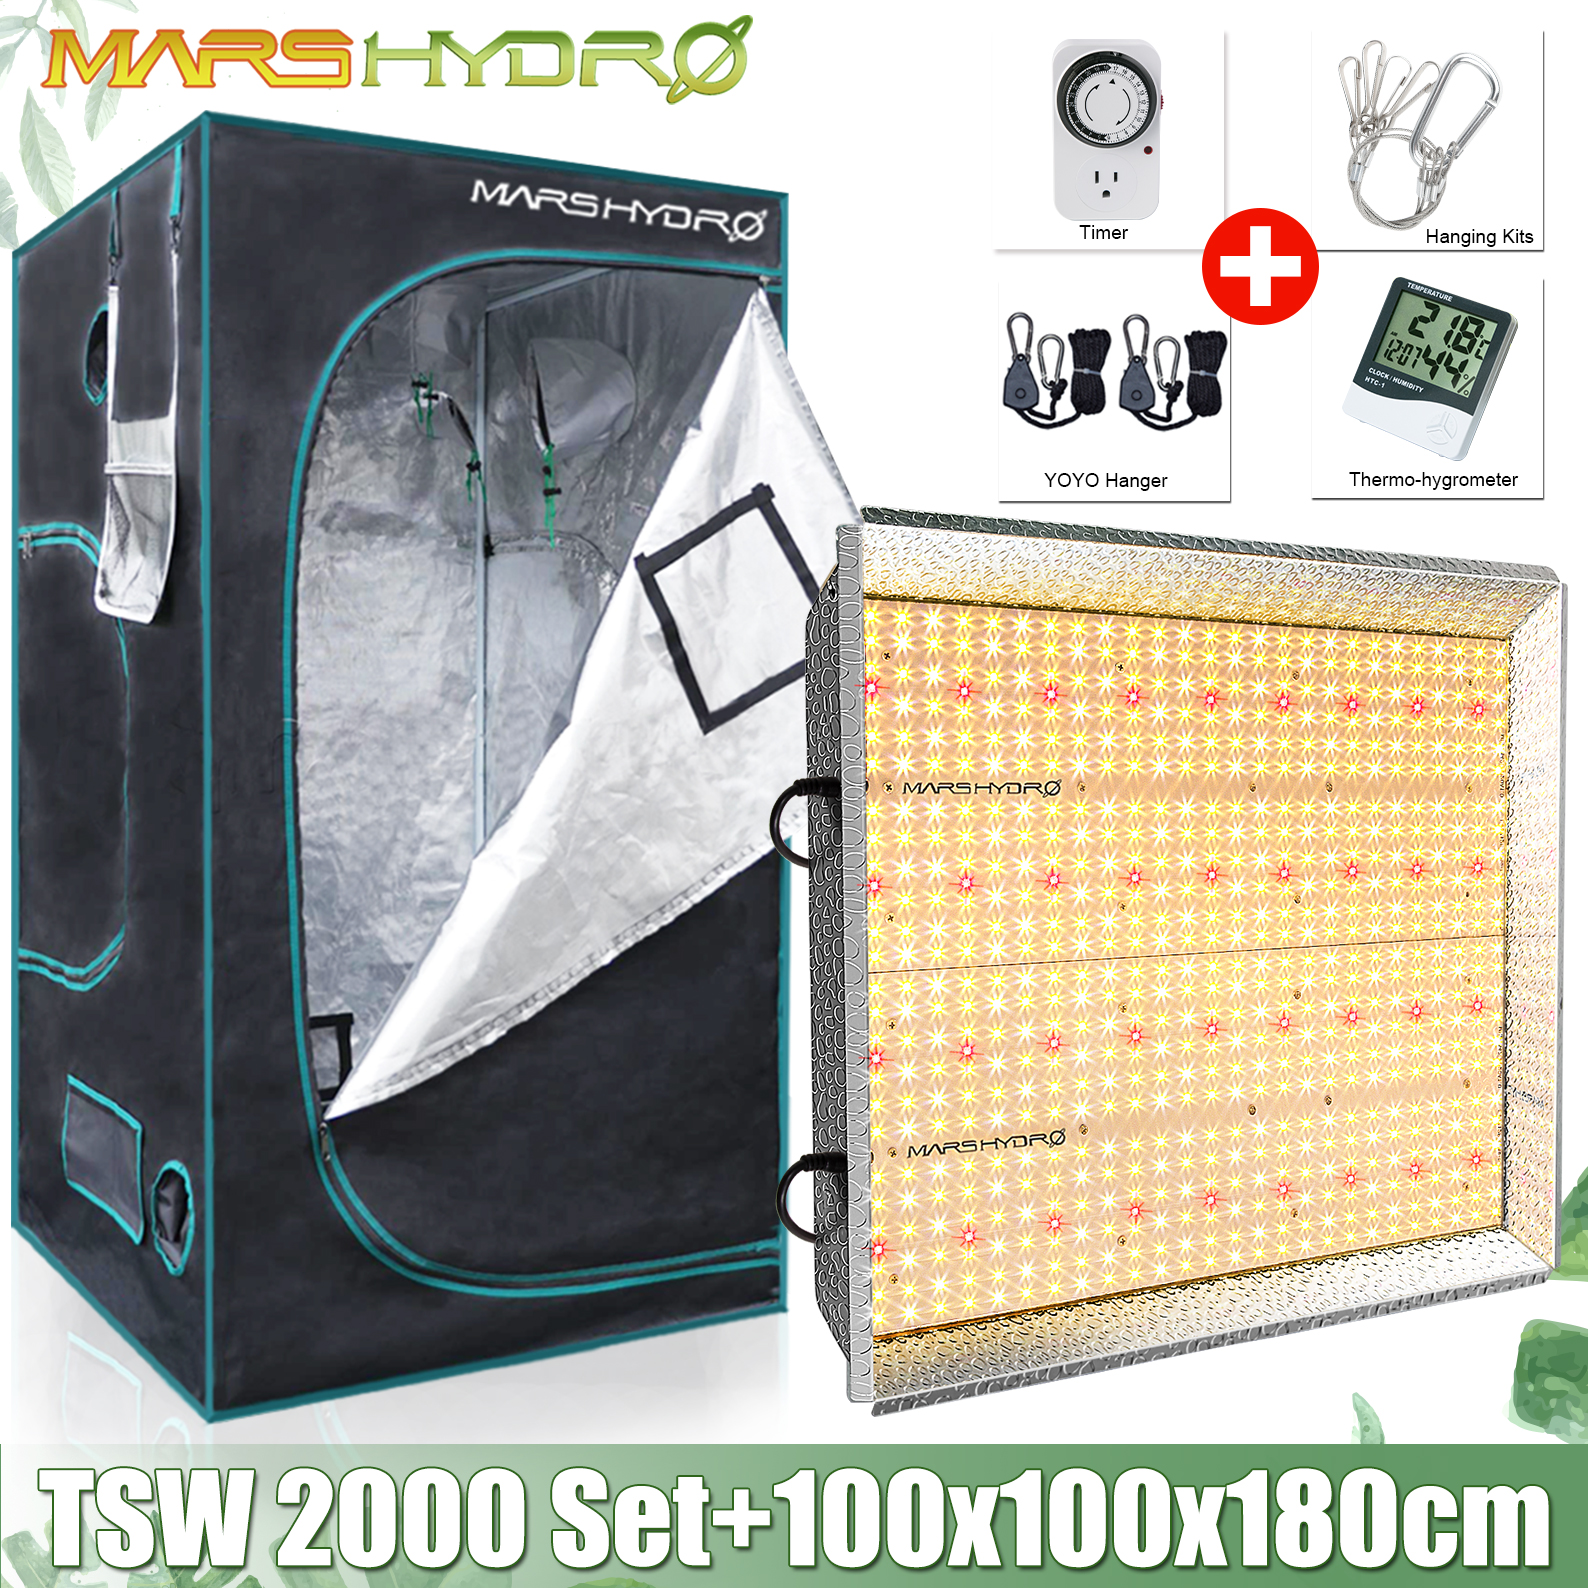 Mars Hydro TSW 2000W Panel de luz LED de cultivo de espectro completo + 100x100x180cm Kits de cultivo carpa hidropónica